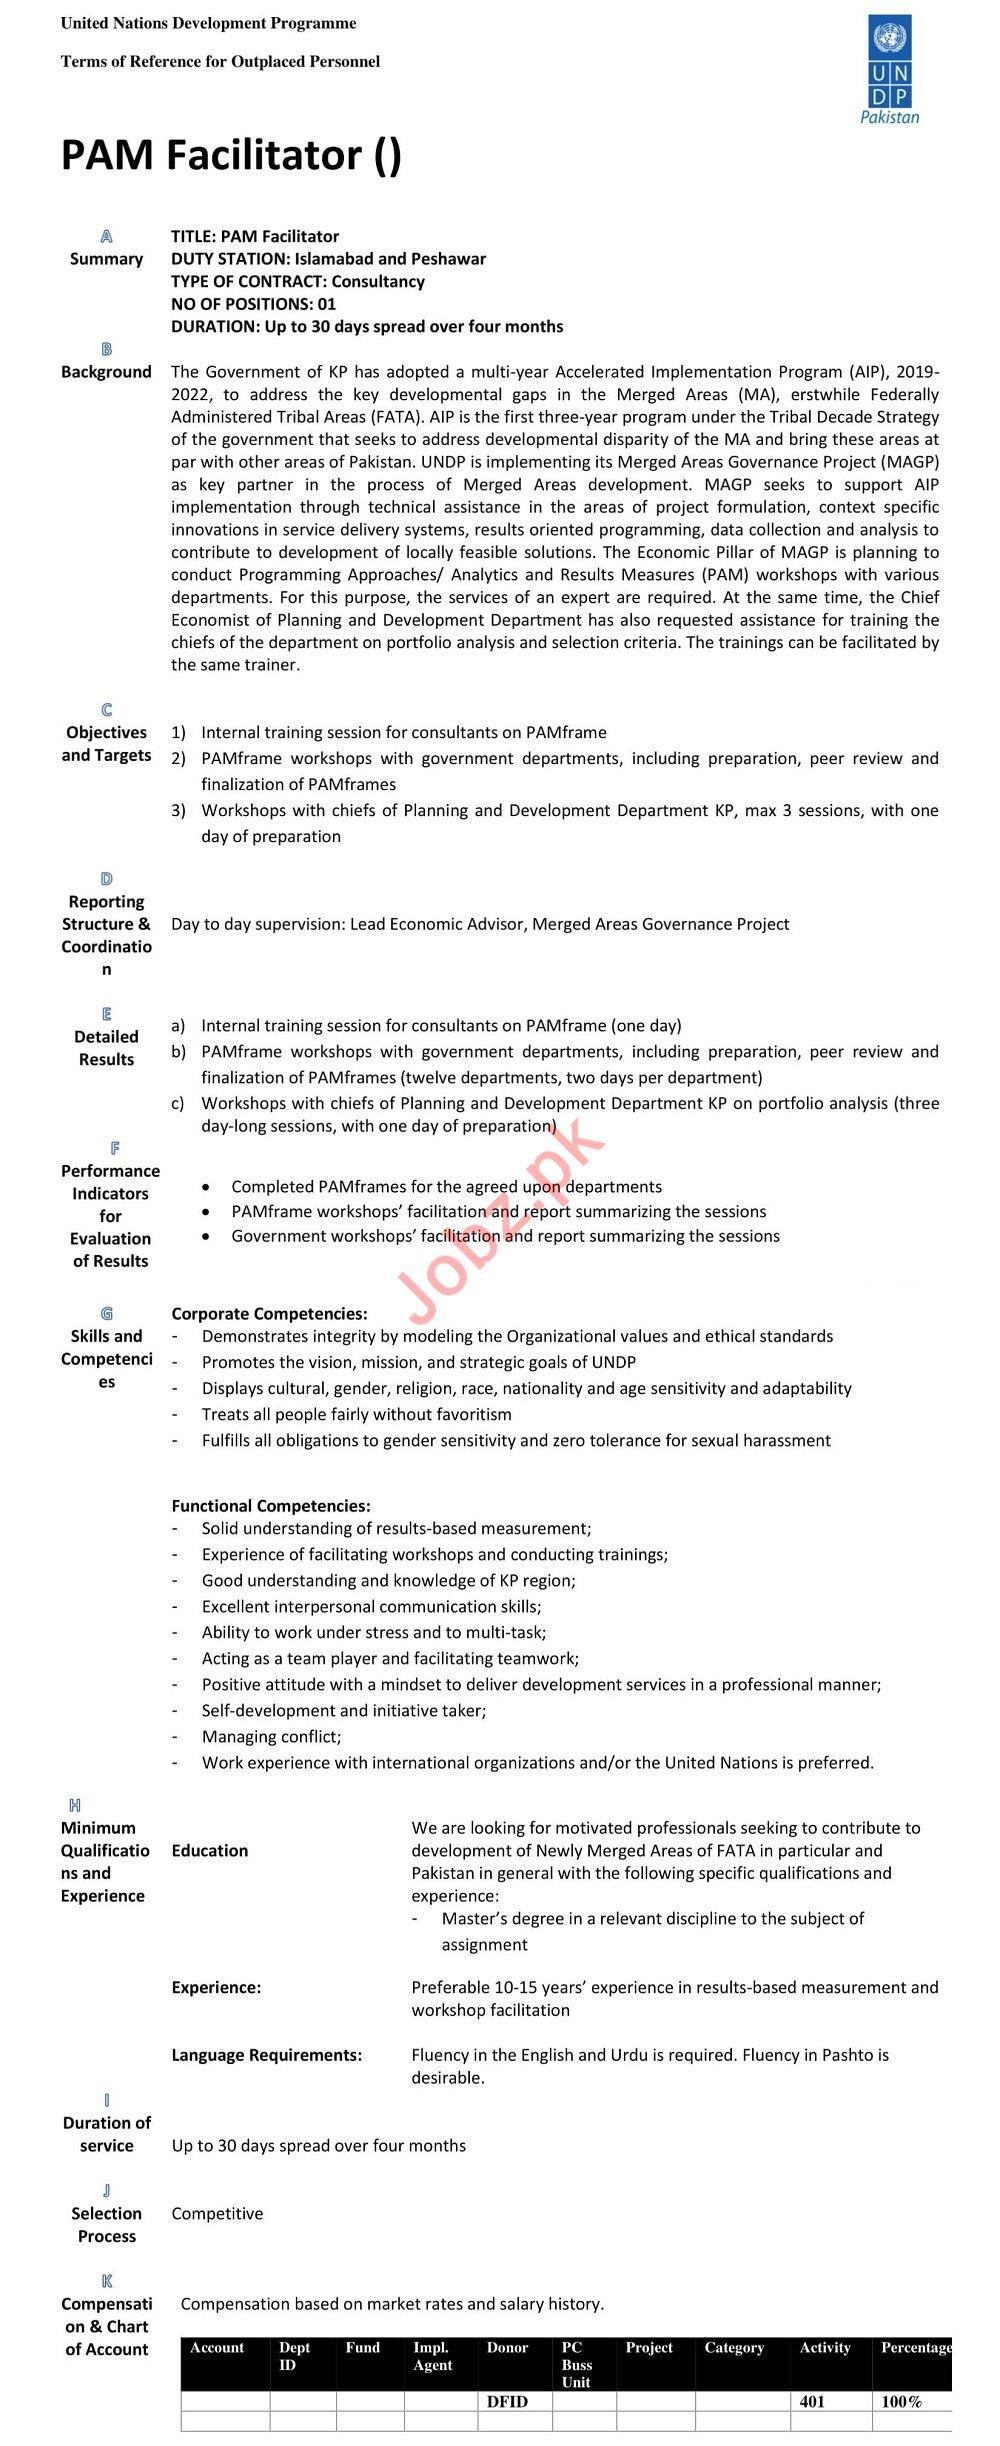 UNDP Islamabad Jobs 2020 for PAM Facilitator